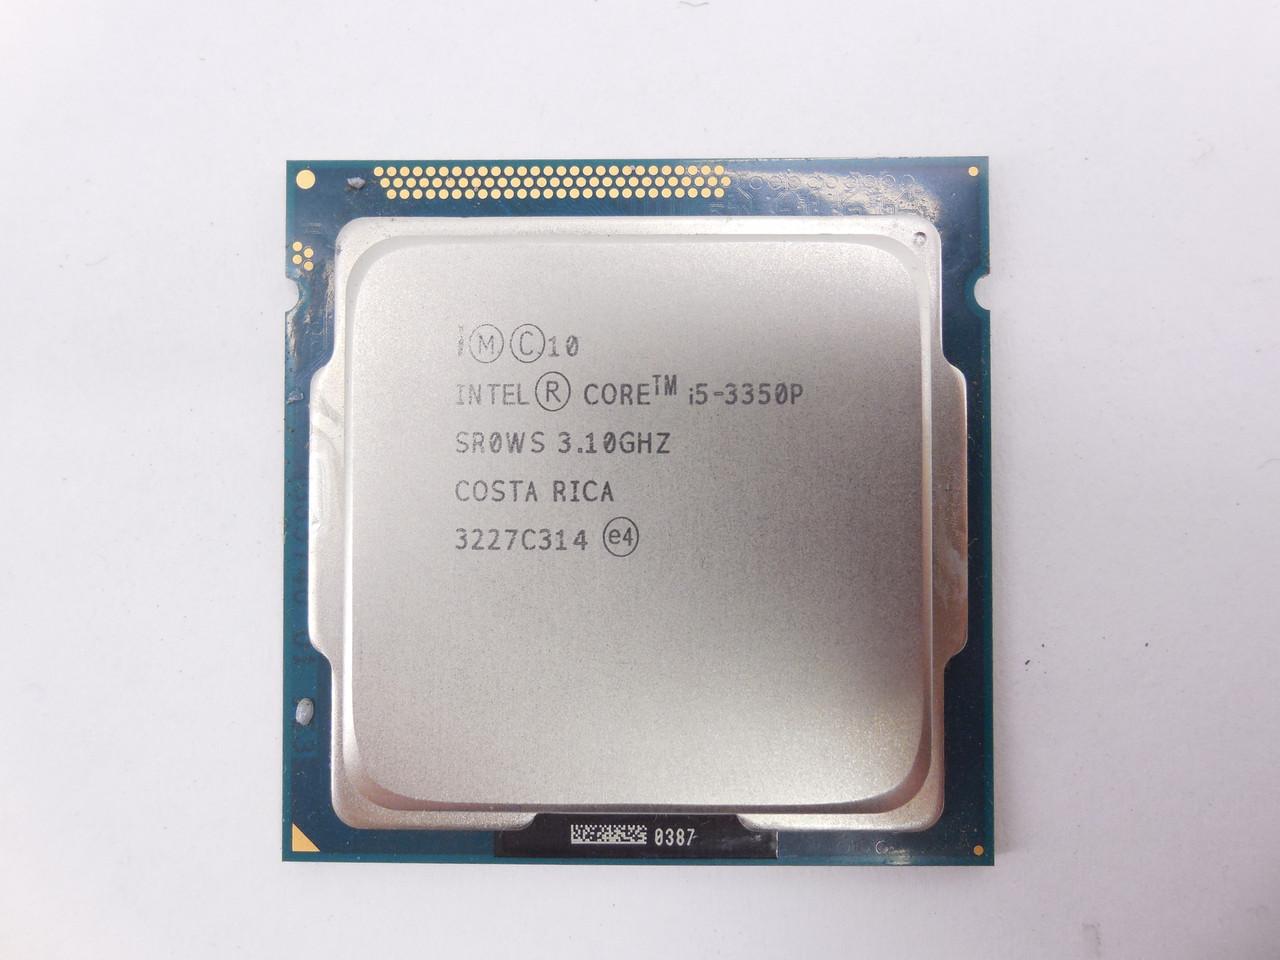 Процессор Intel Core i5-3350P 3.10GHz (SR0WS) s1155, tray